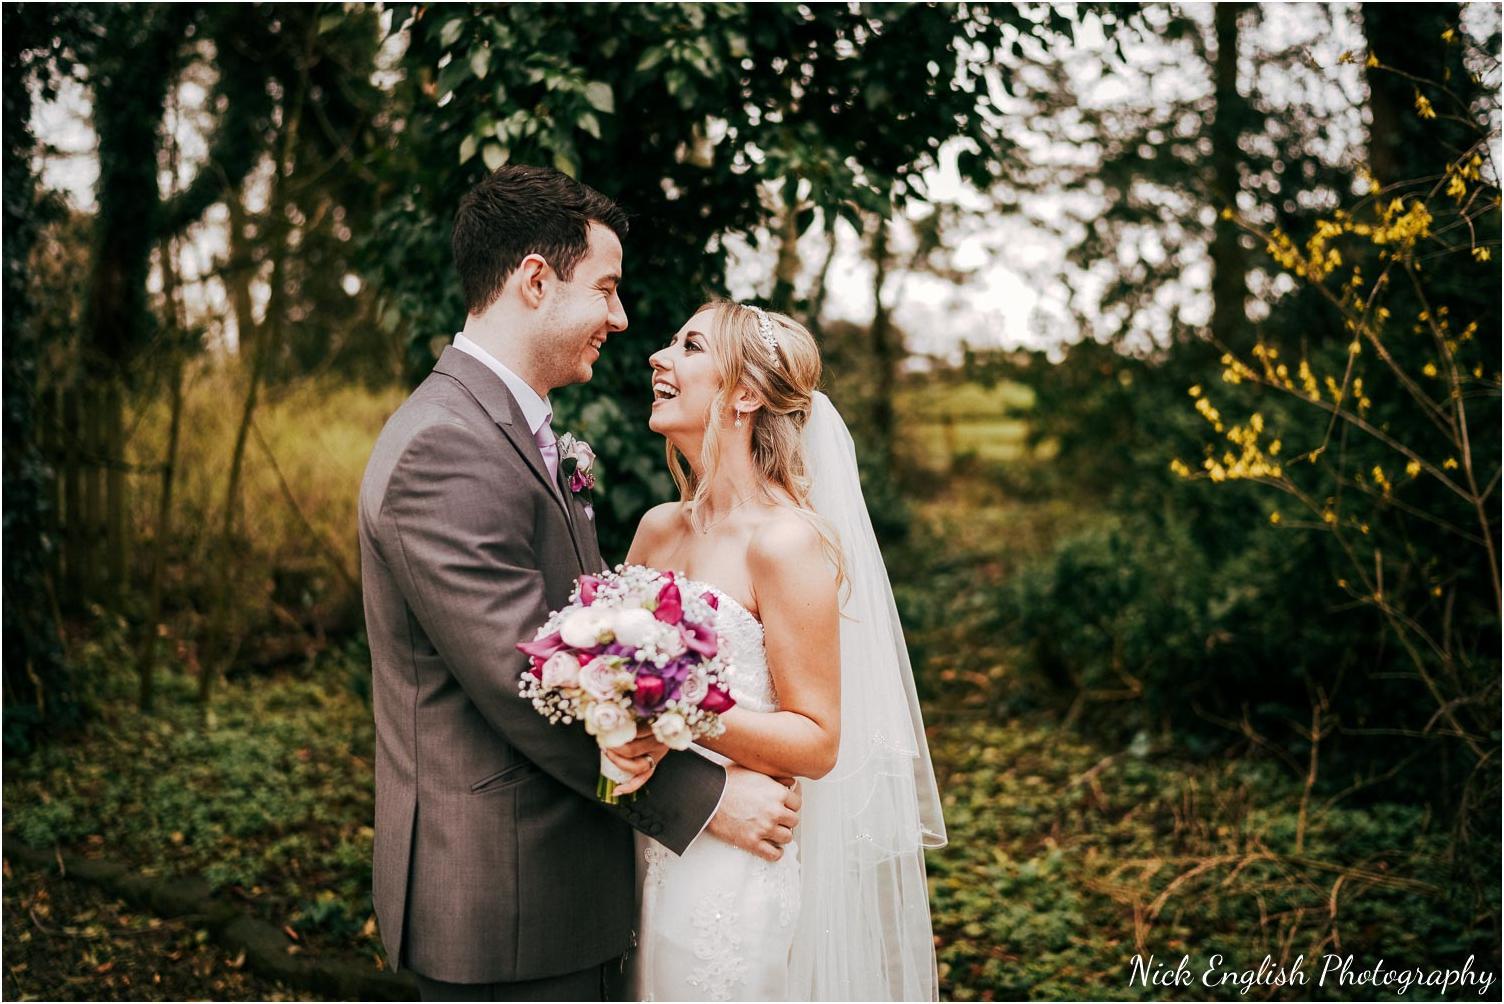 Mitton_Hall_Wedding_Photographer_2018-115.jpg